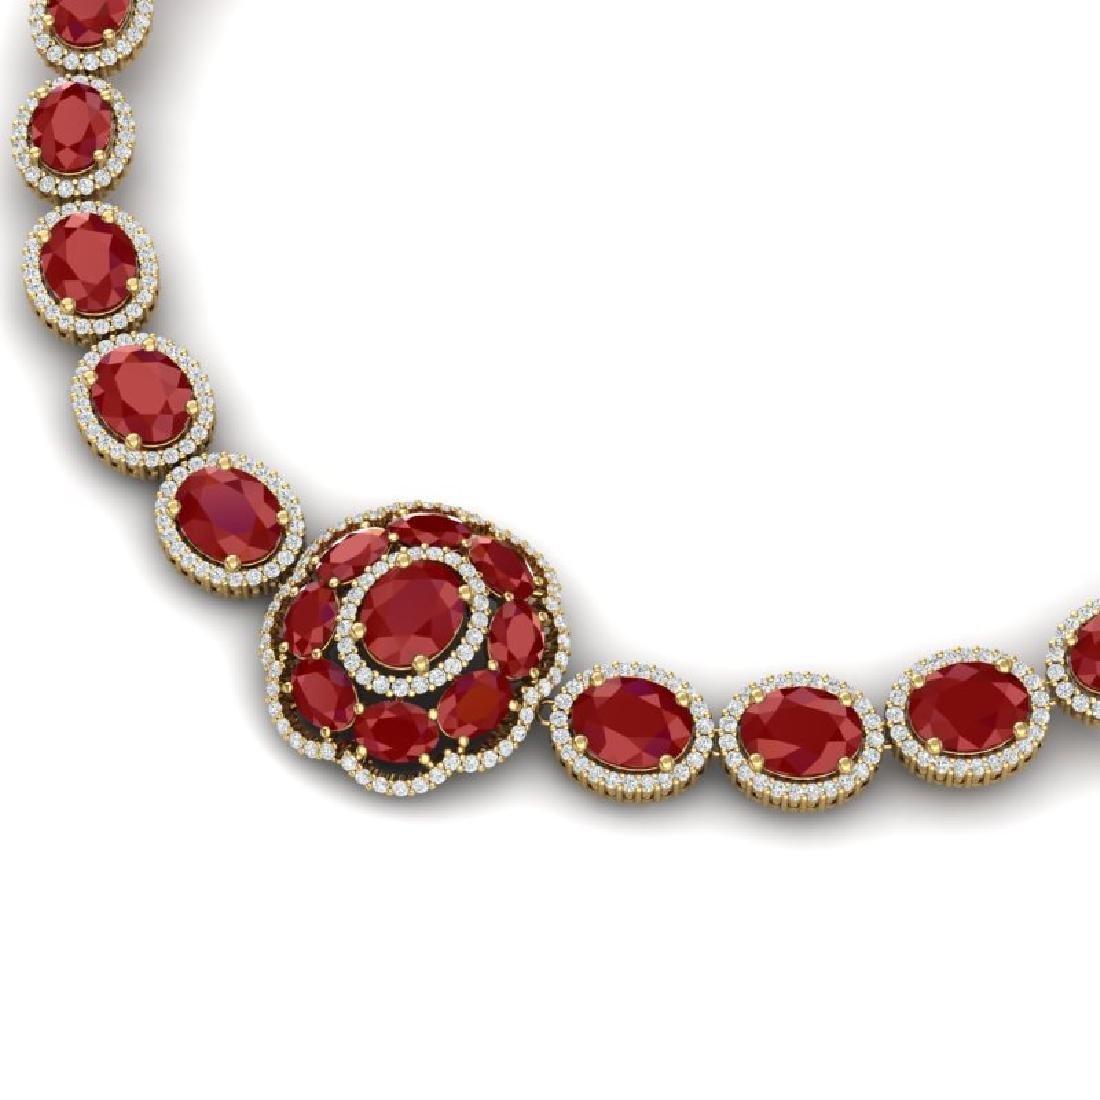 58.33 CTW Royalty Ruby & VS Diamond Necklace 18K Yellow